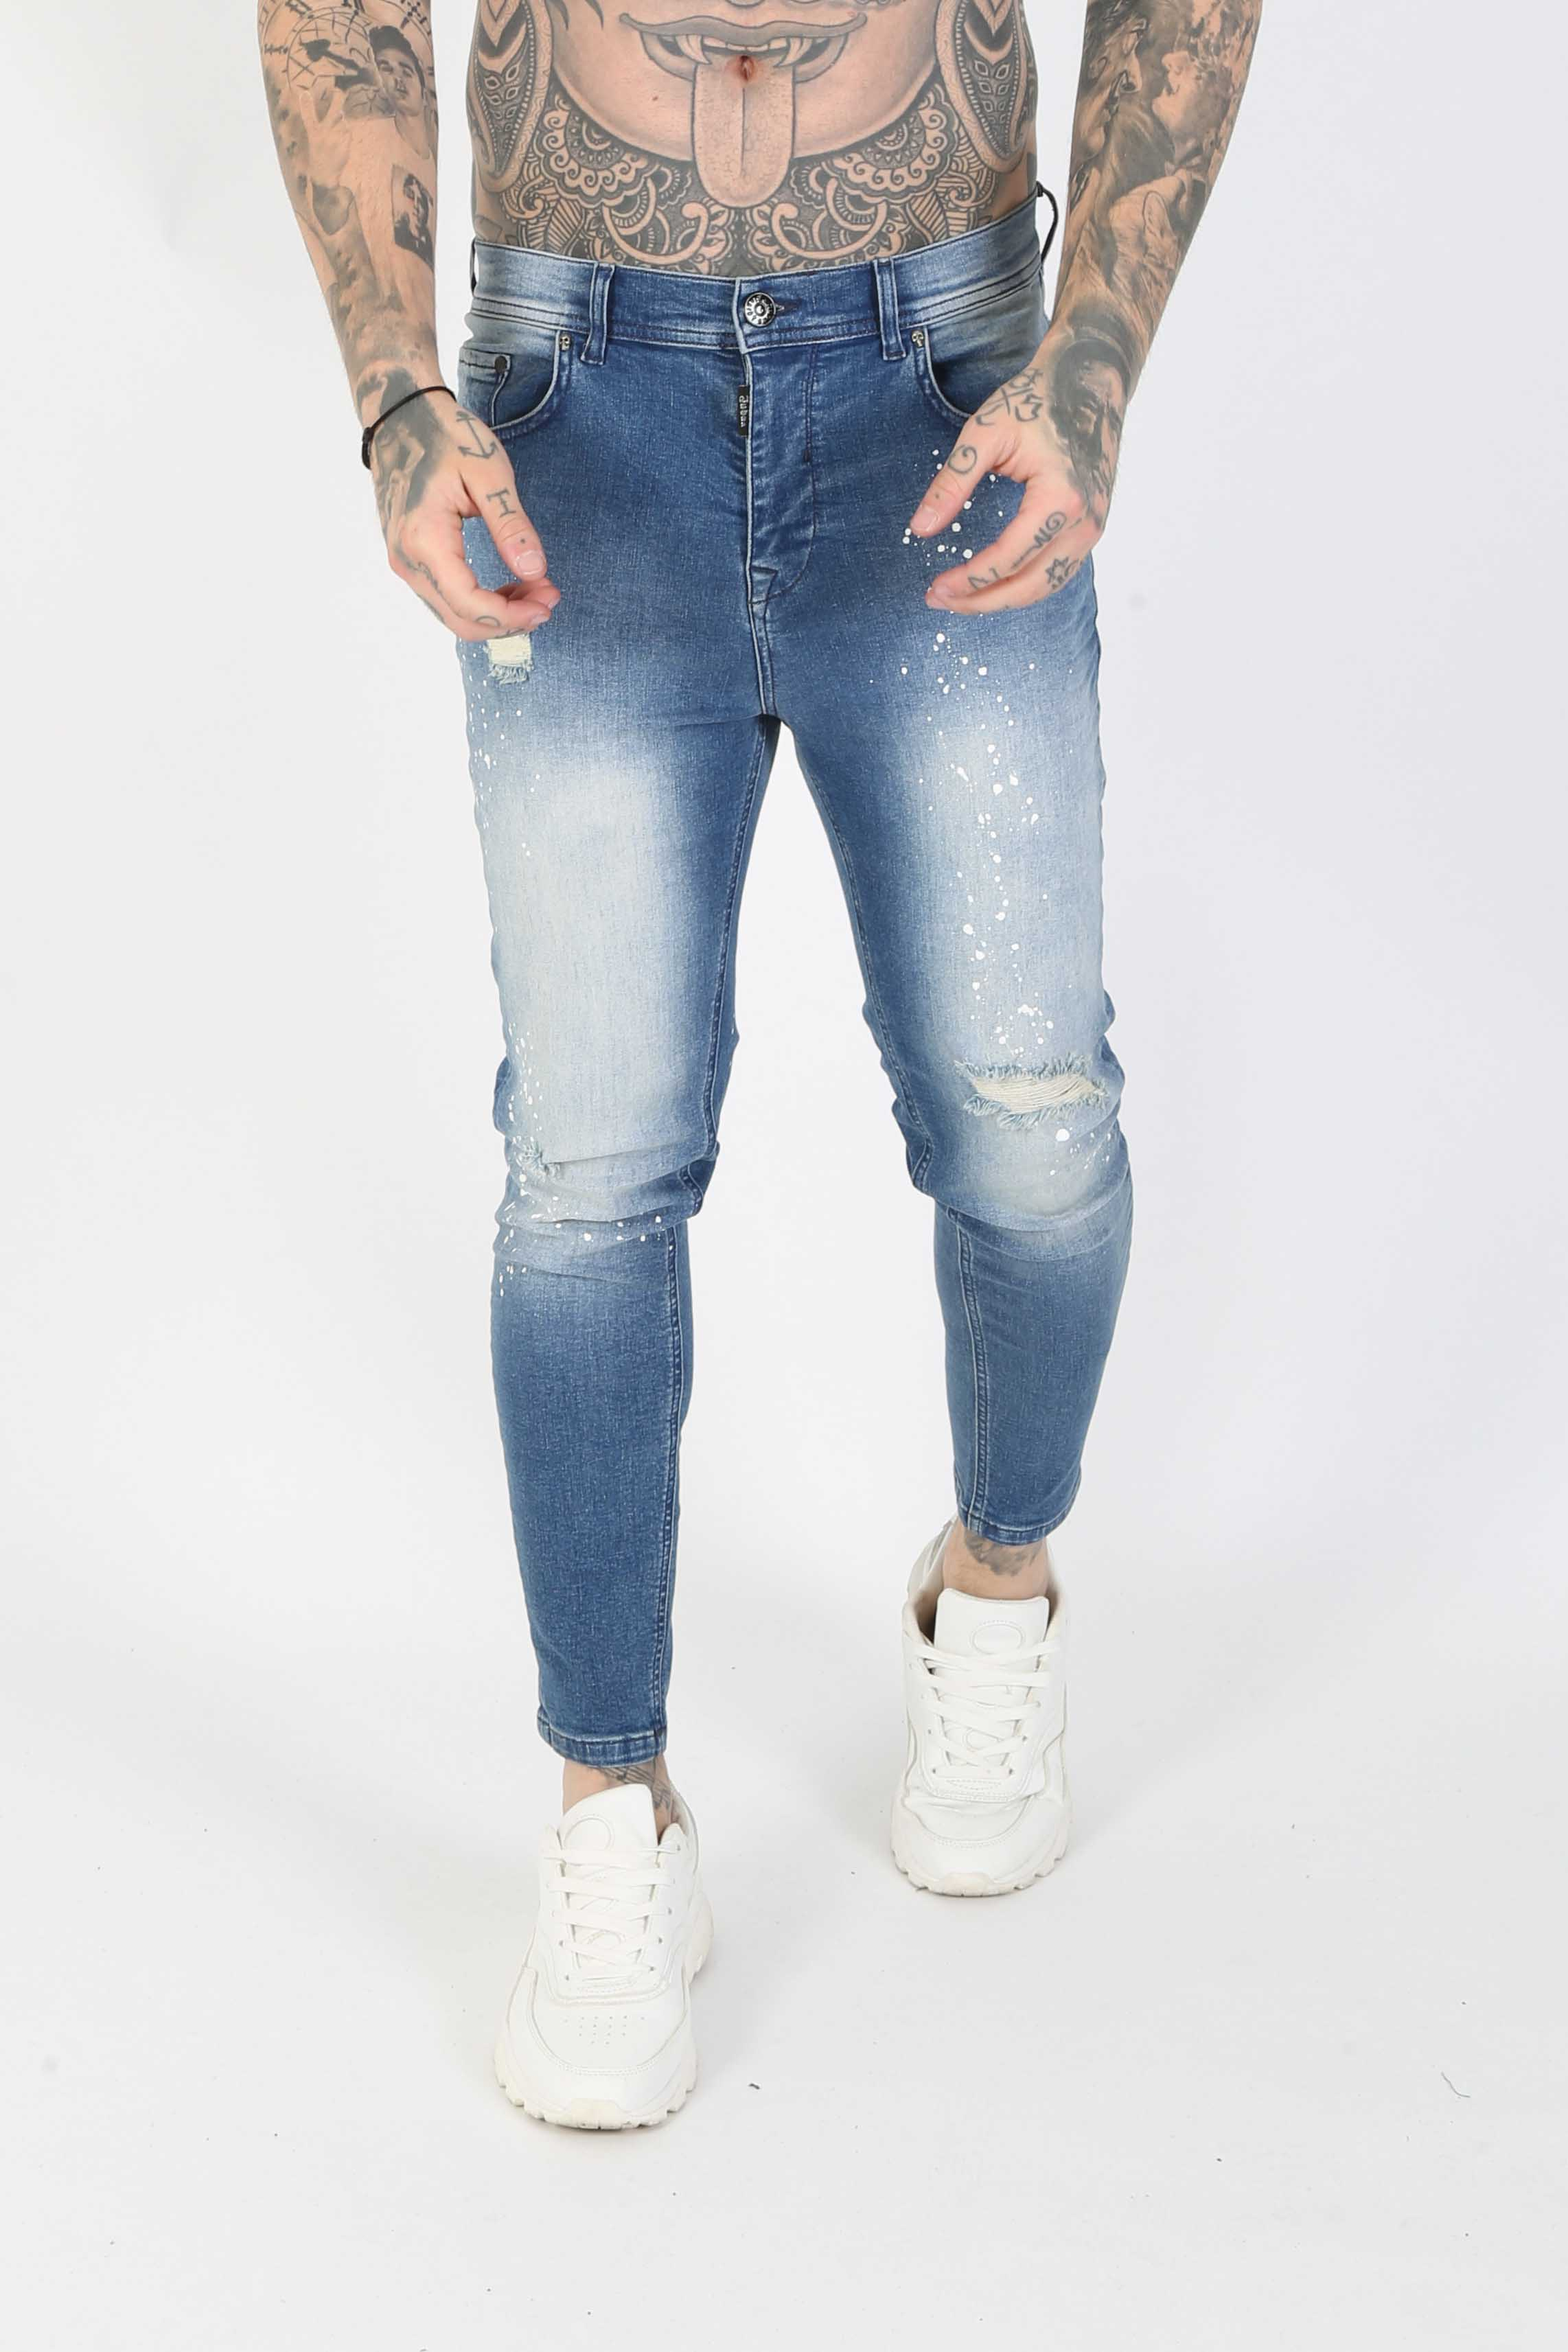 Judd Paint Splatter Distressed Men's Skinny Jeans - Blast Blue, 36 inch waist